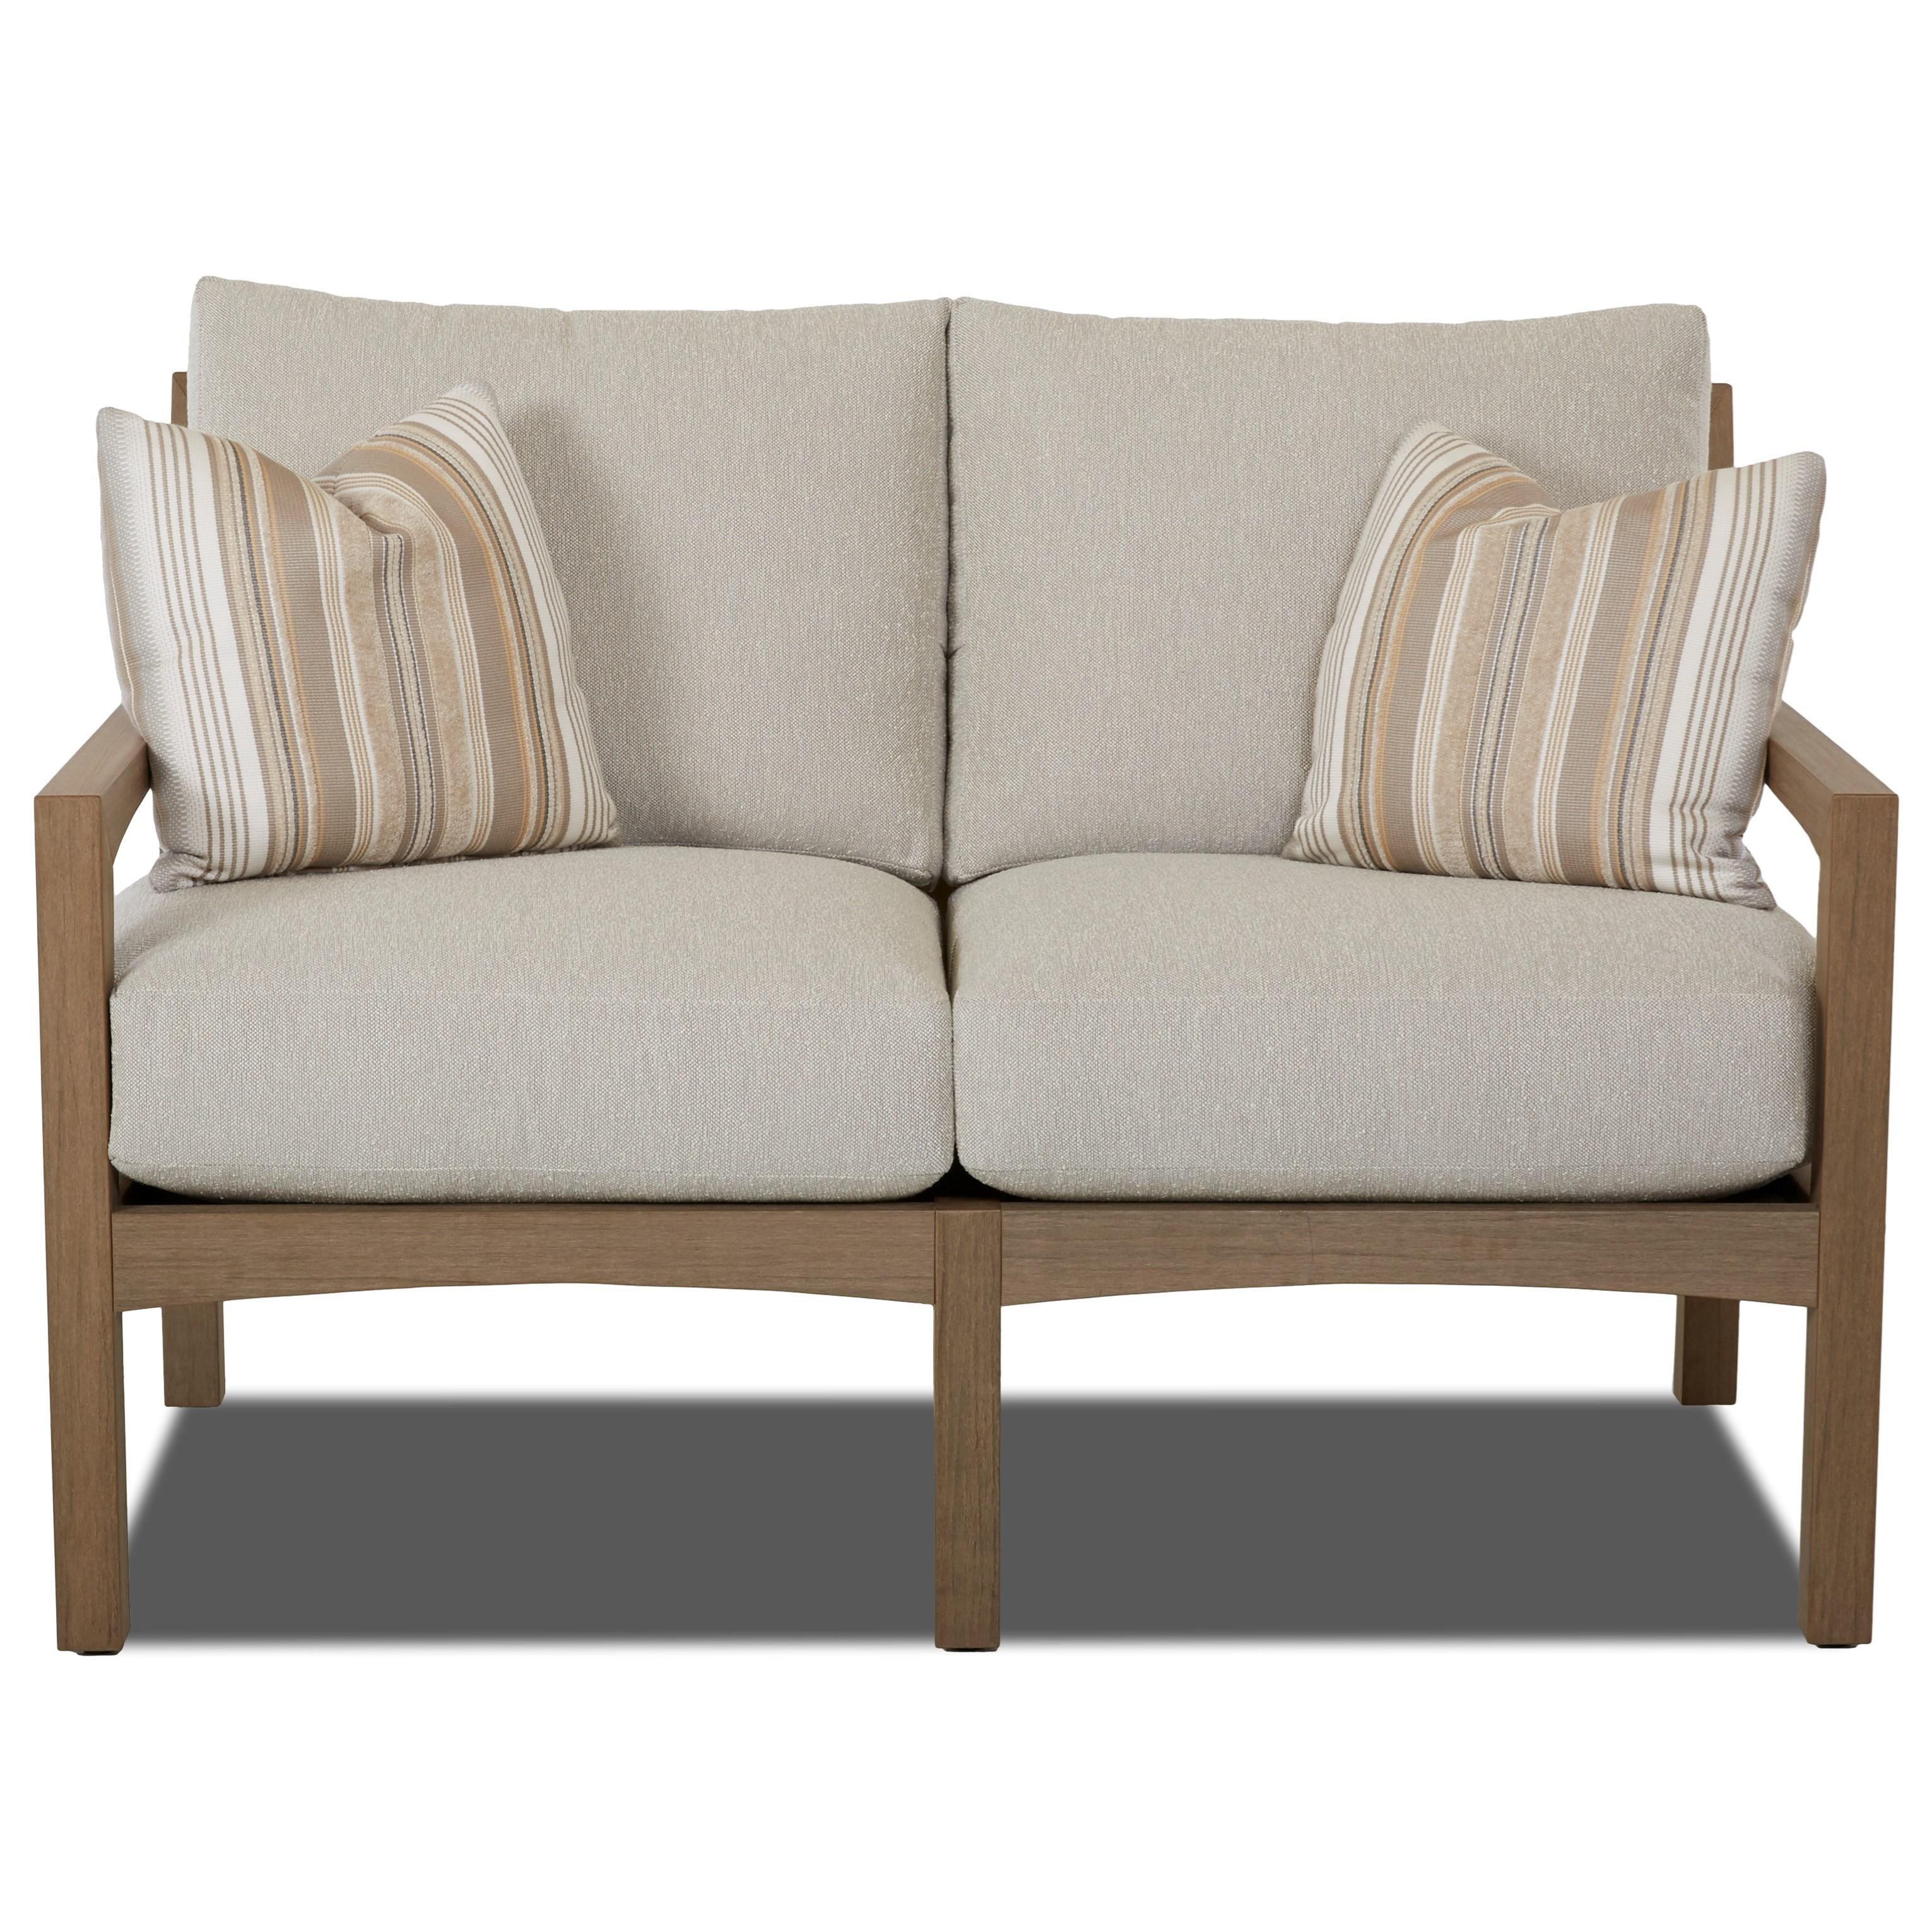 Loveseat w/ Drainable Cushion